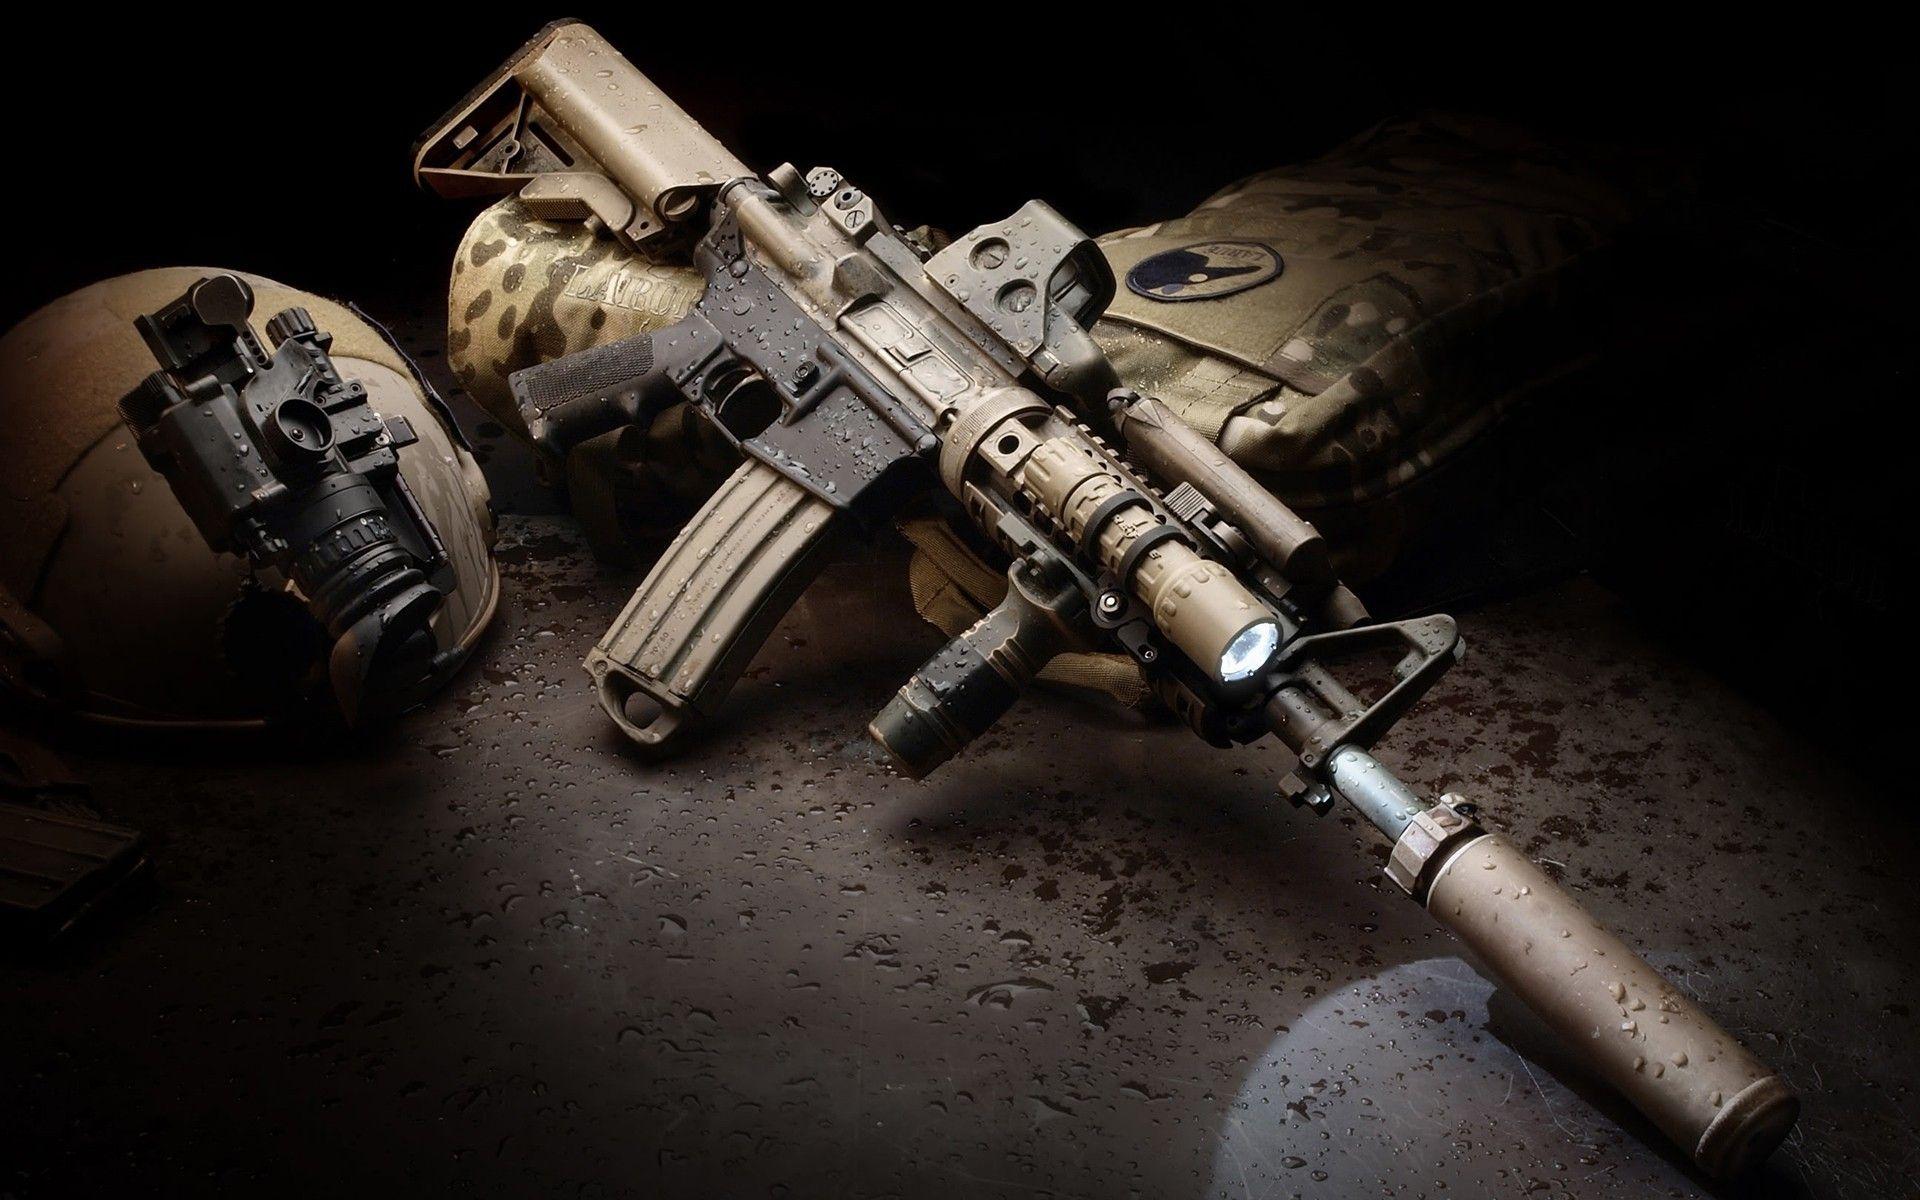 Download Wallpaper 240x400 Automaton, Magpul, Ar-15, Bullets ...